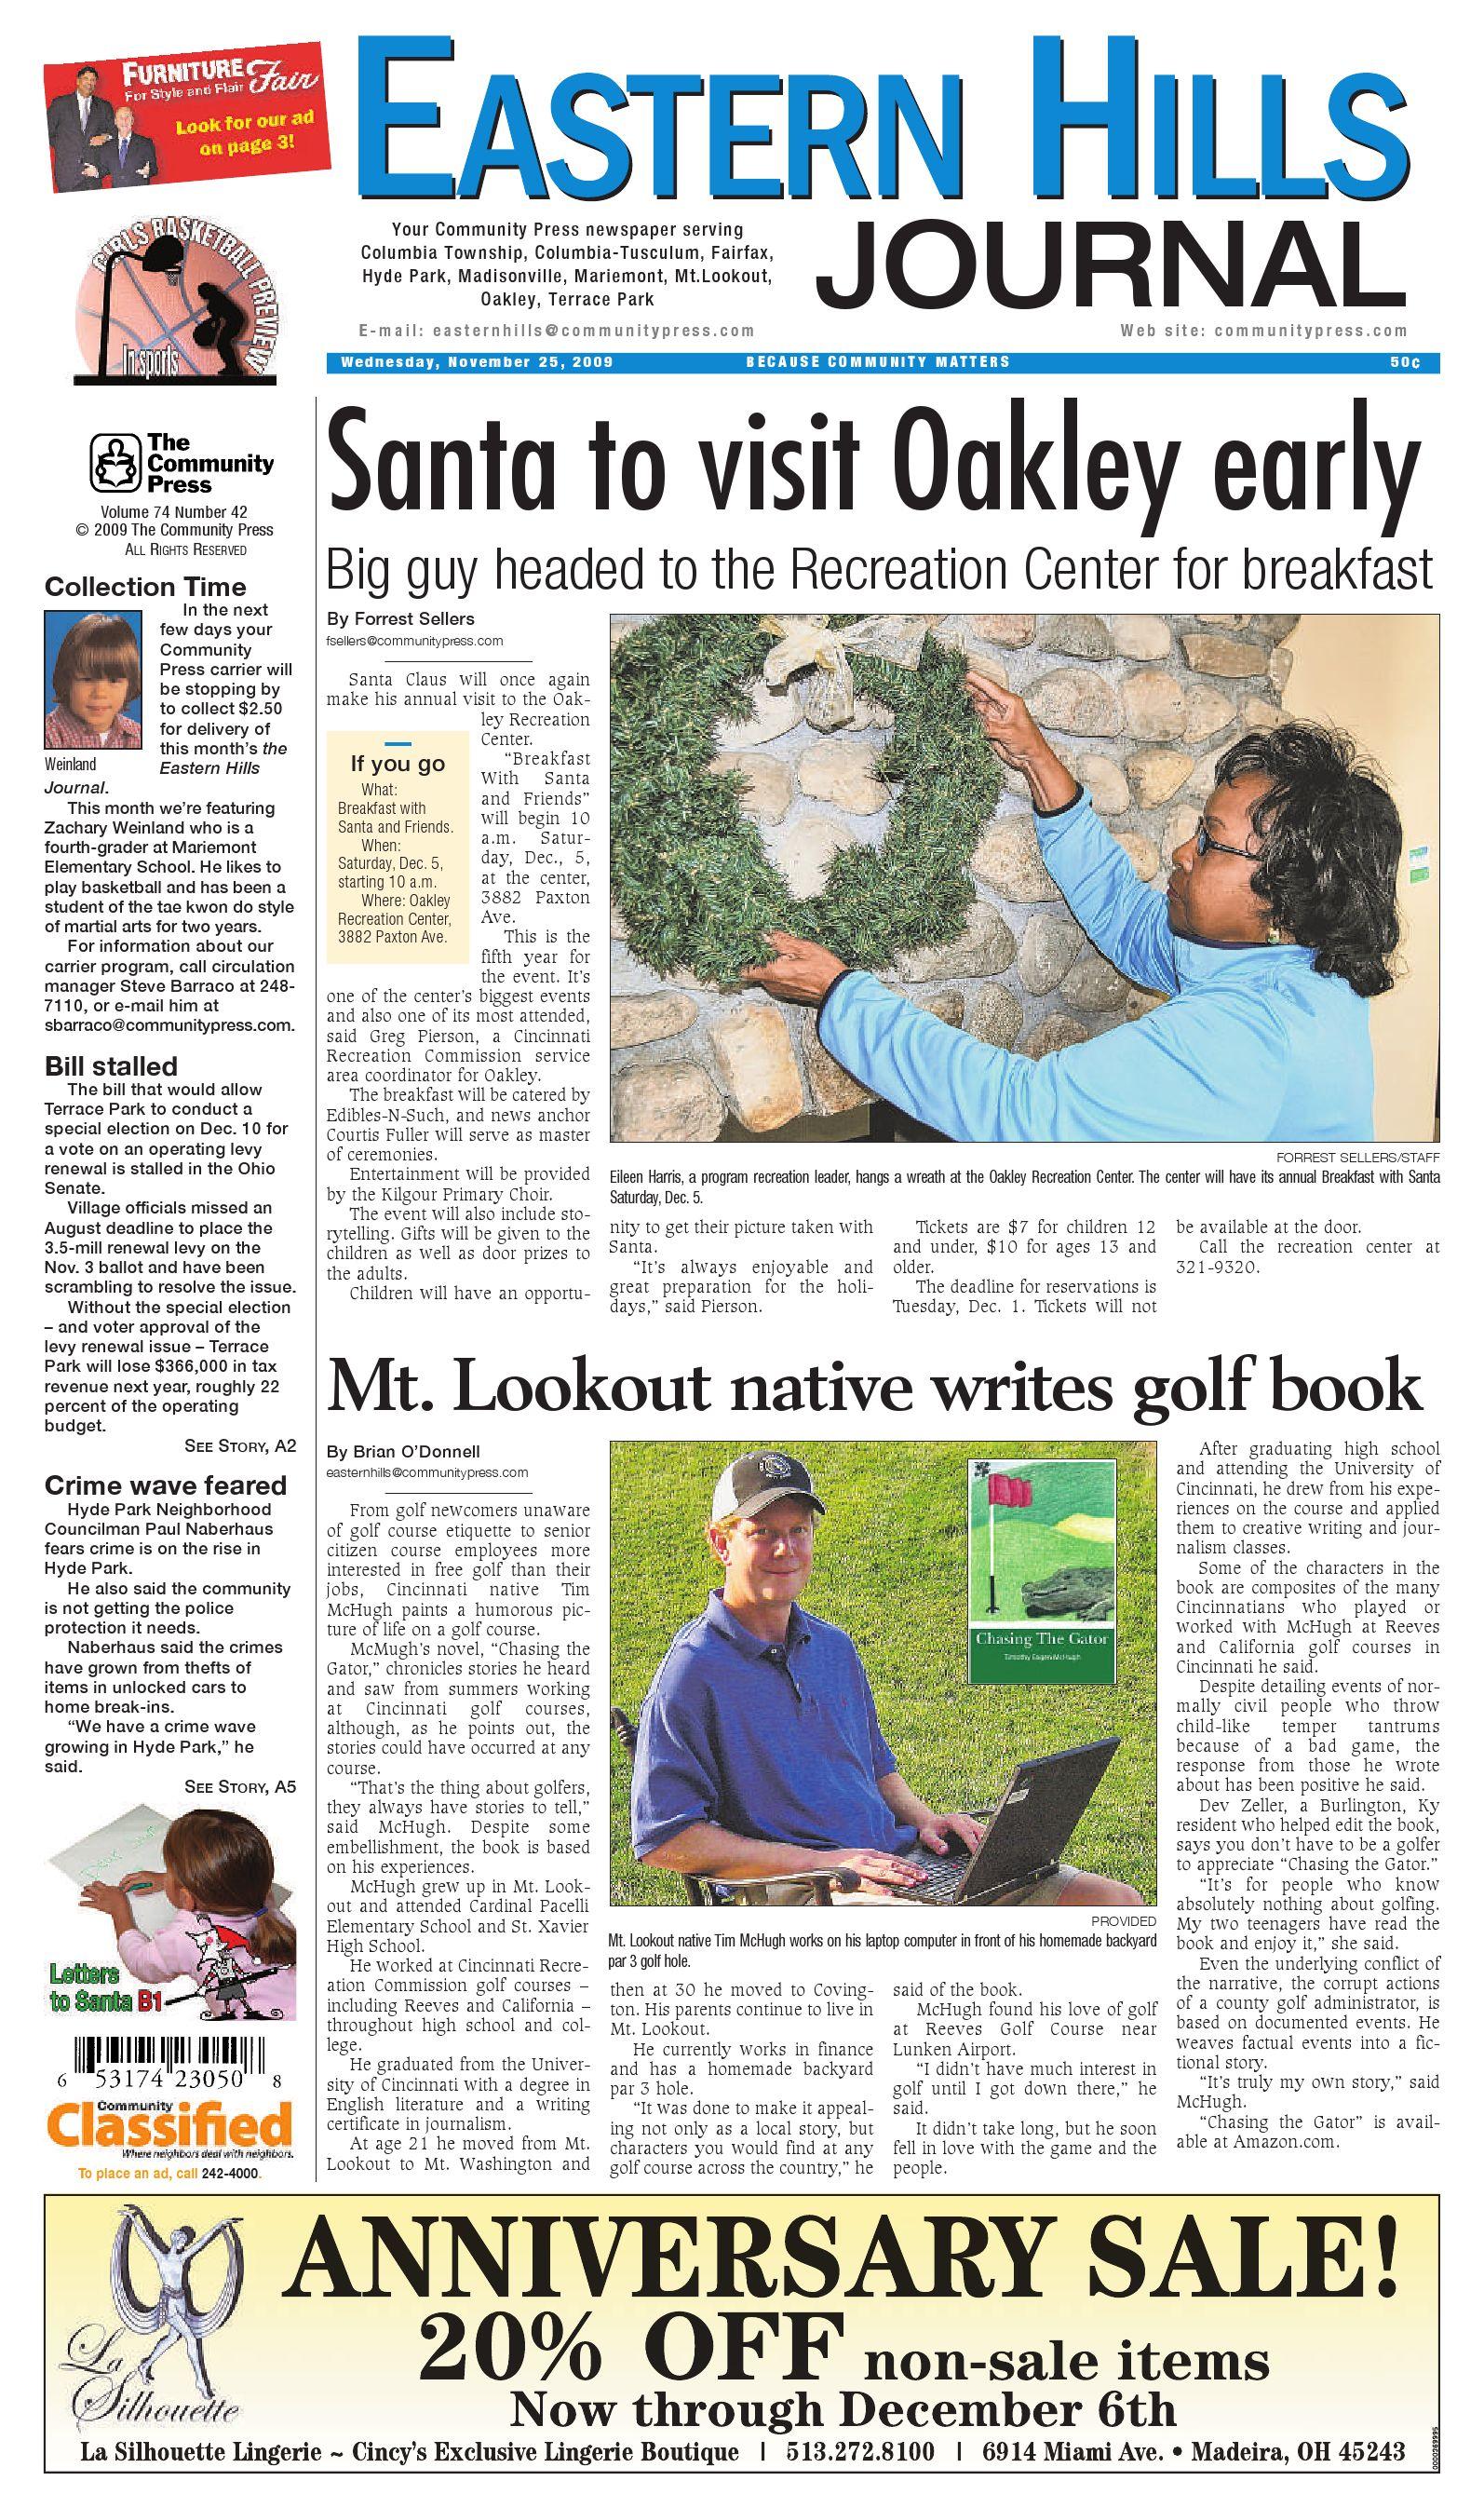 f23b48bb6452 eastern-hills-journal-112509 by Enquirer Media - issuu